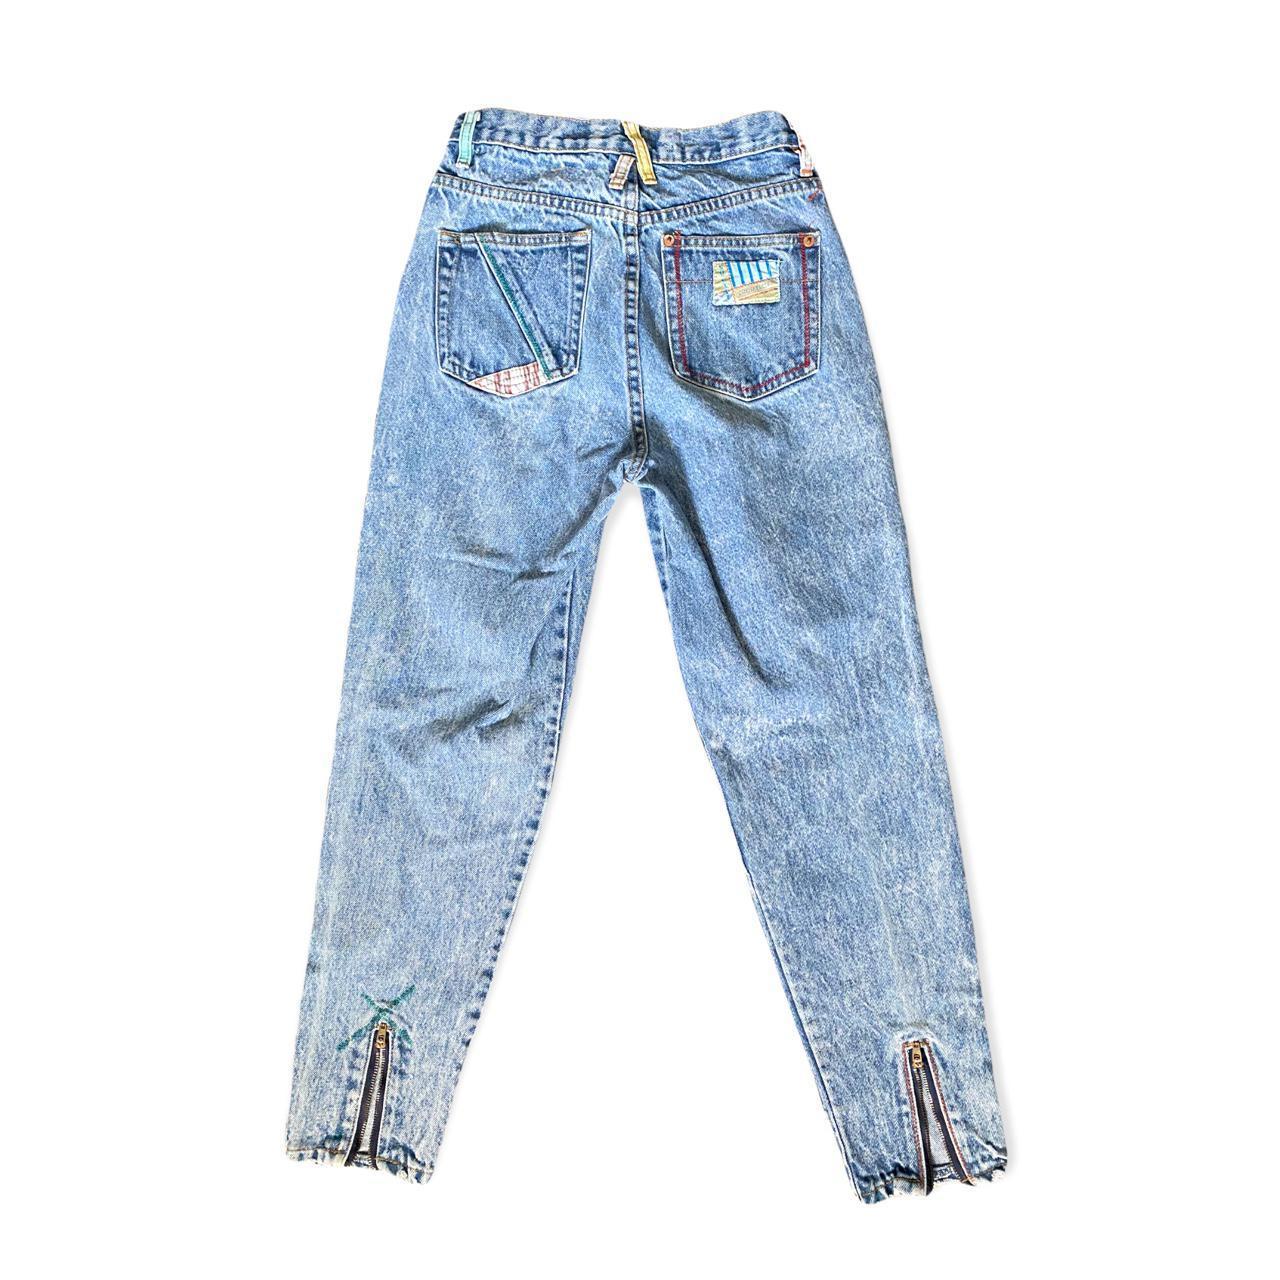 Product Image 1 - Vintage Jordache 90s Mom Jeans